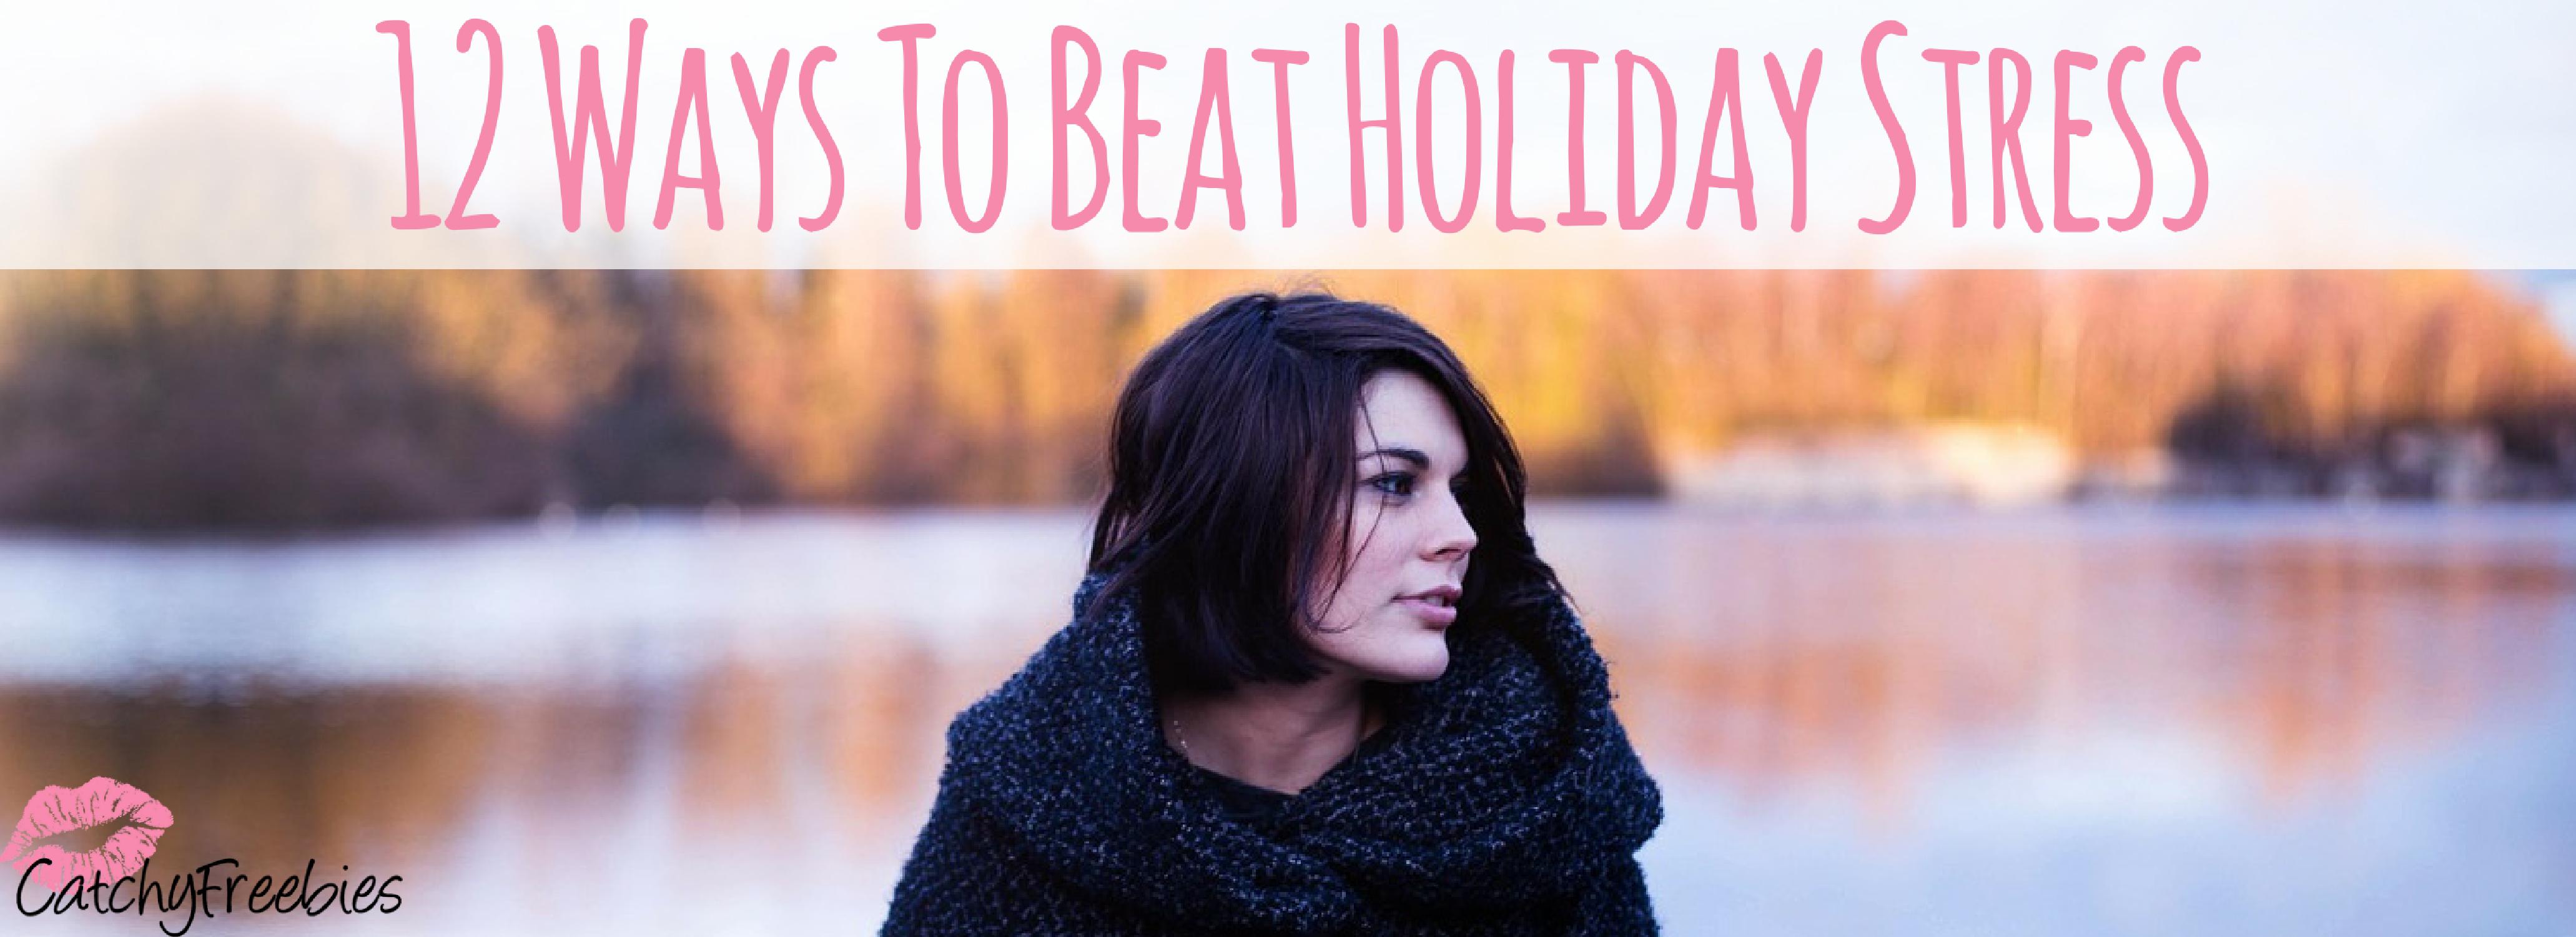 12 Ways To Beat Holiday Stress